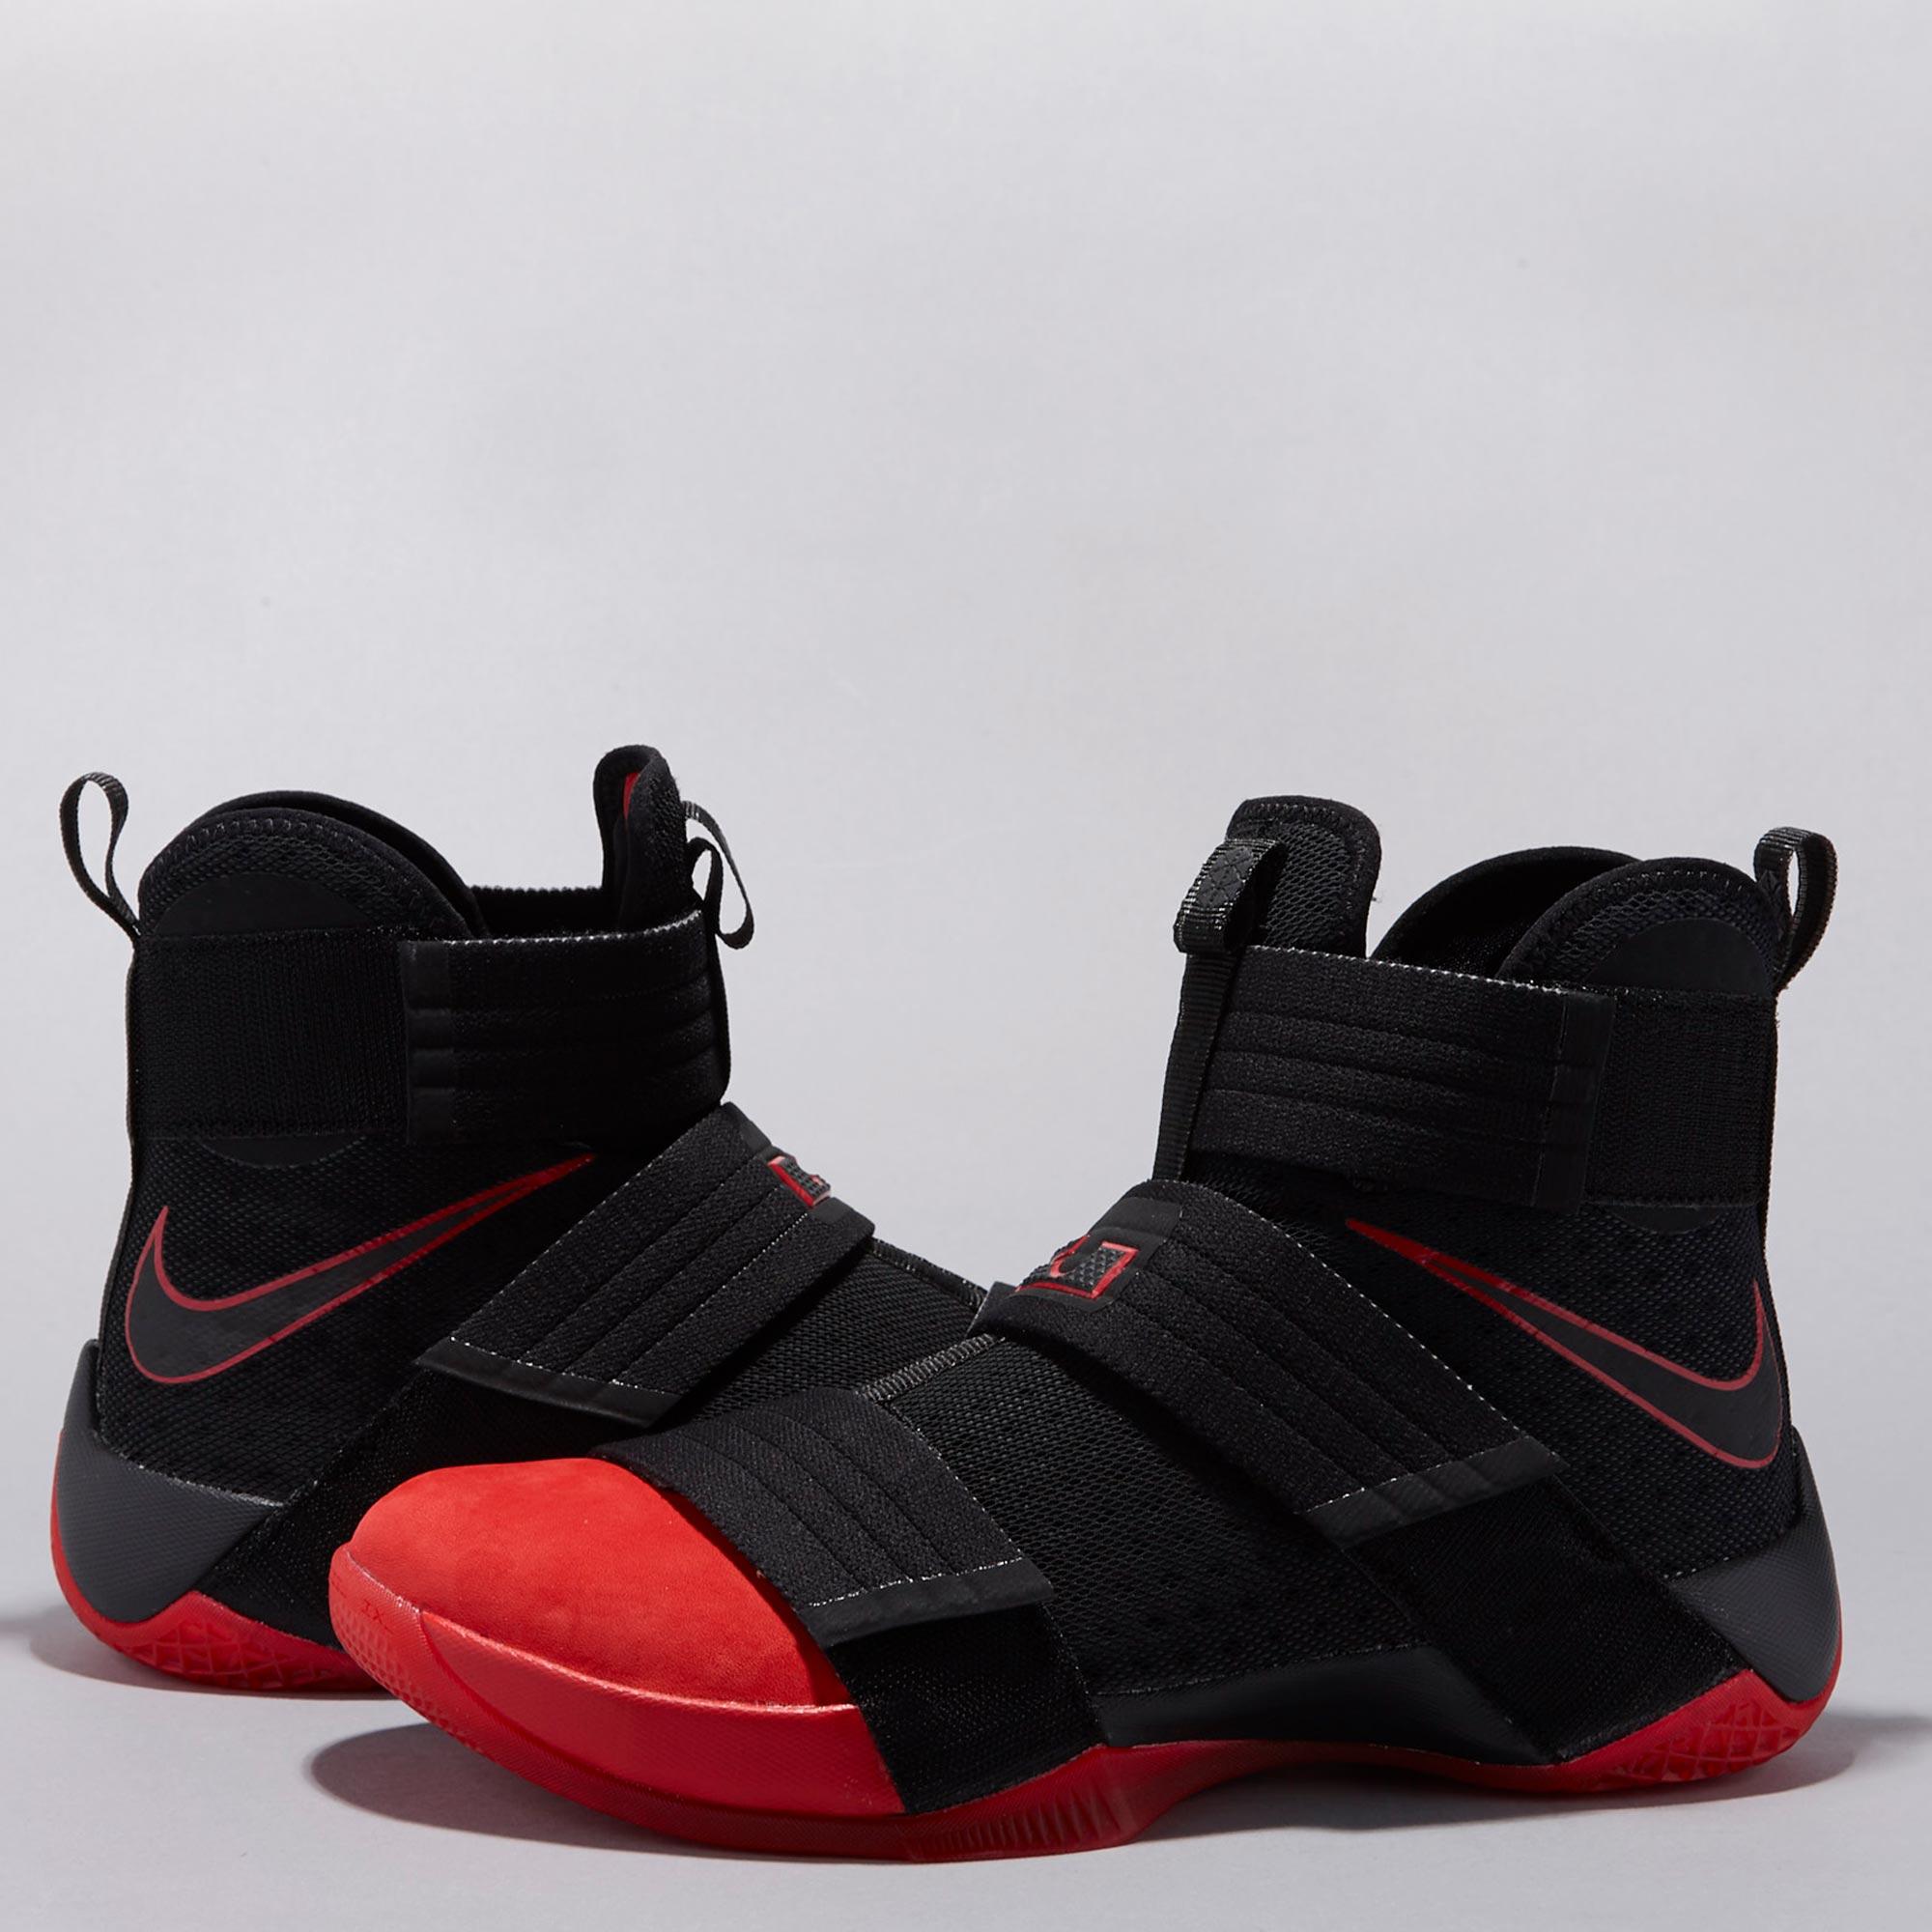 Nike LeBron Soldier 10 SFG Basketball Shoe - Black/University Red